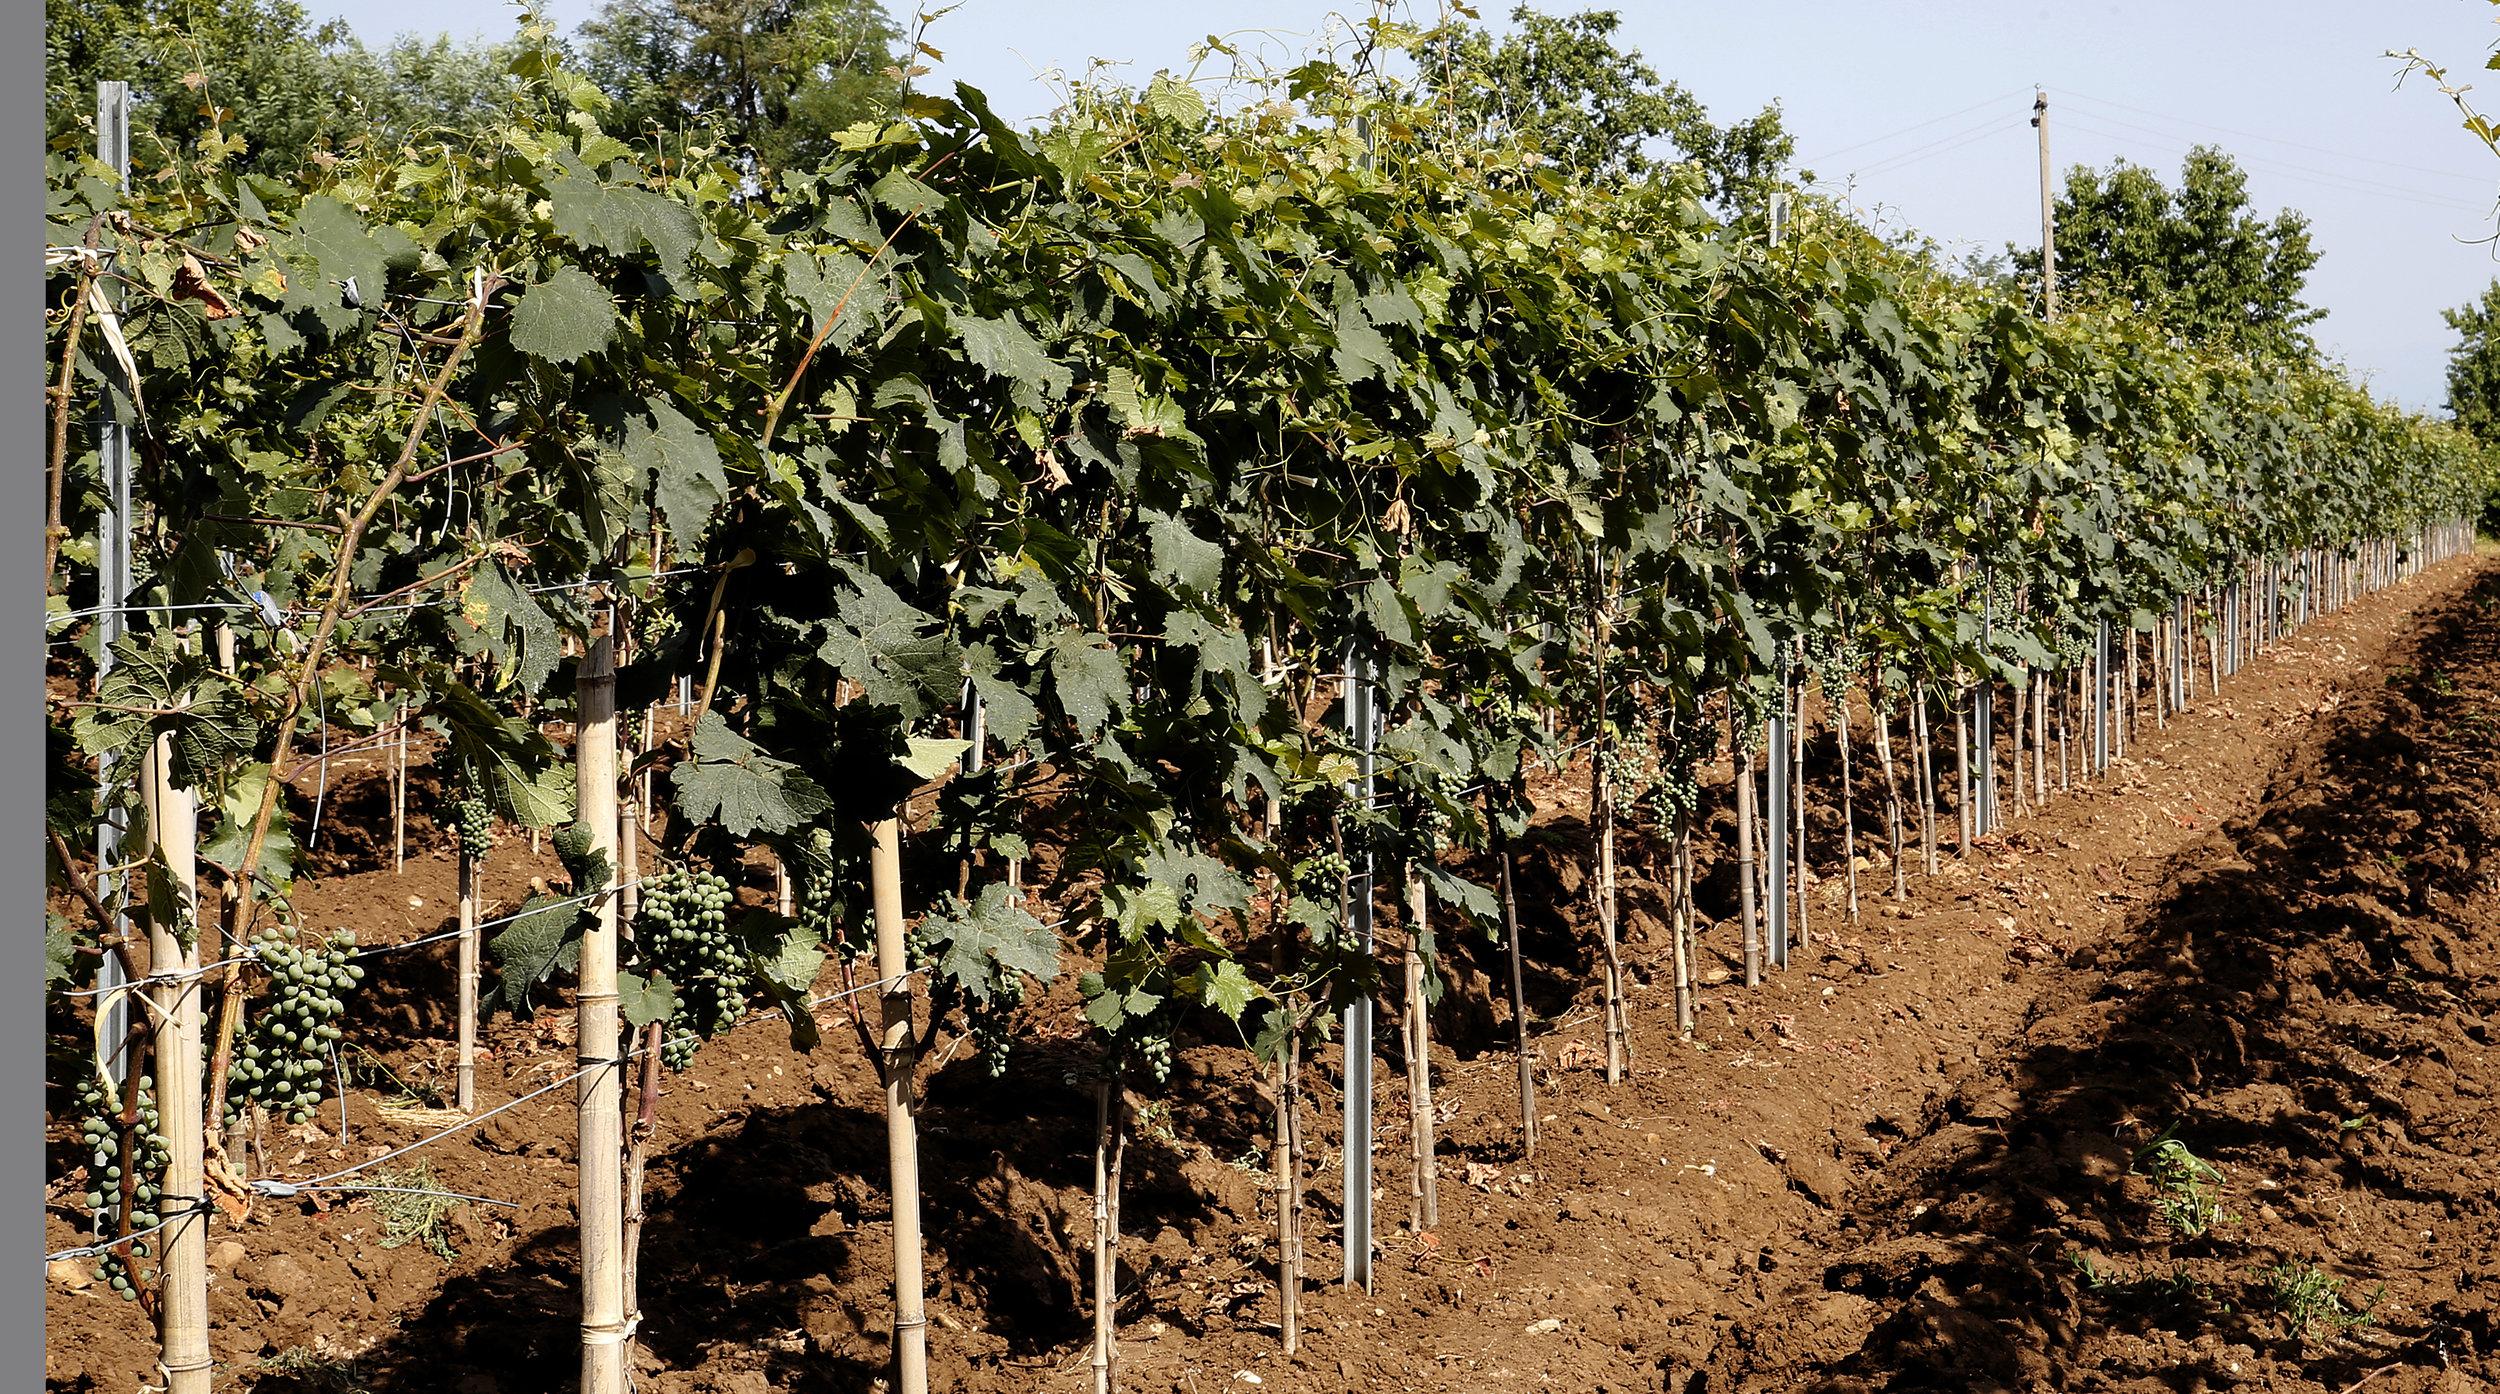 Grapes such as Saperavi, Mtsvane and Khikhvi are grown on the vineyard in Kakheti Georgia